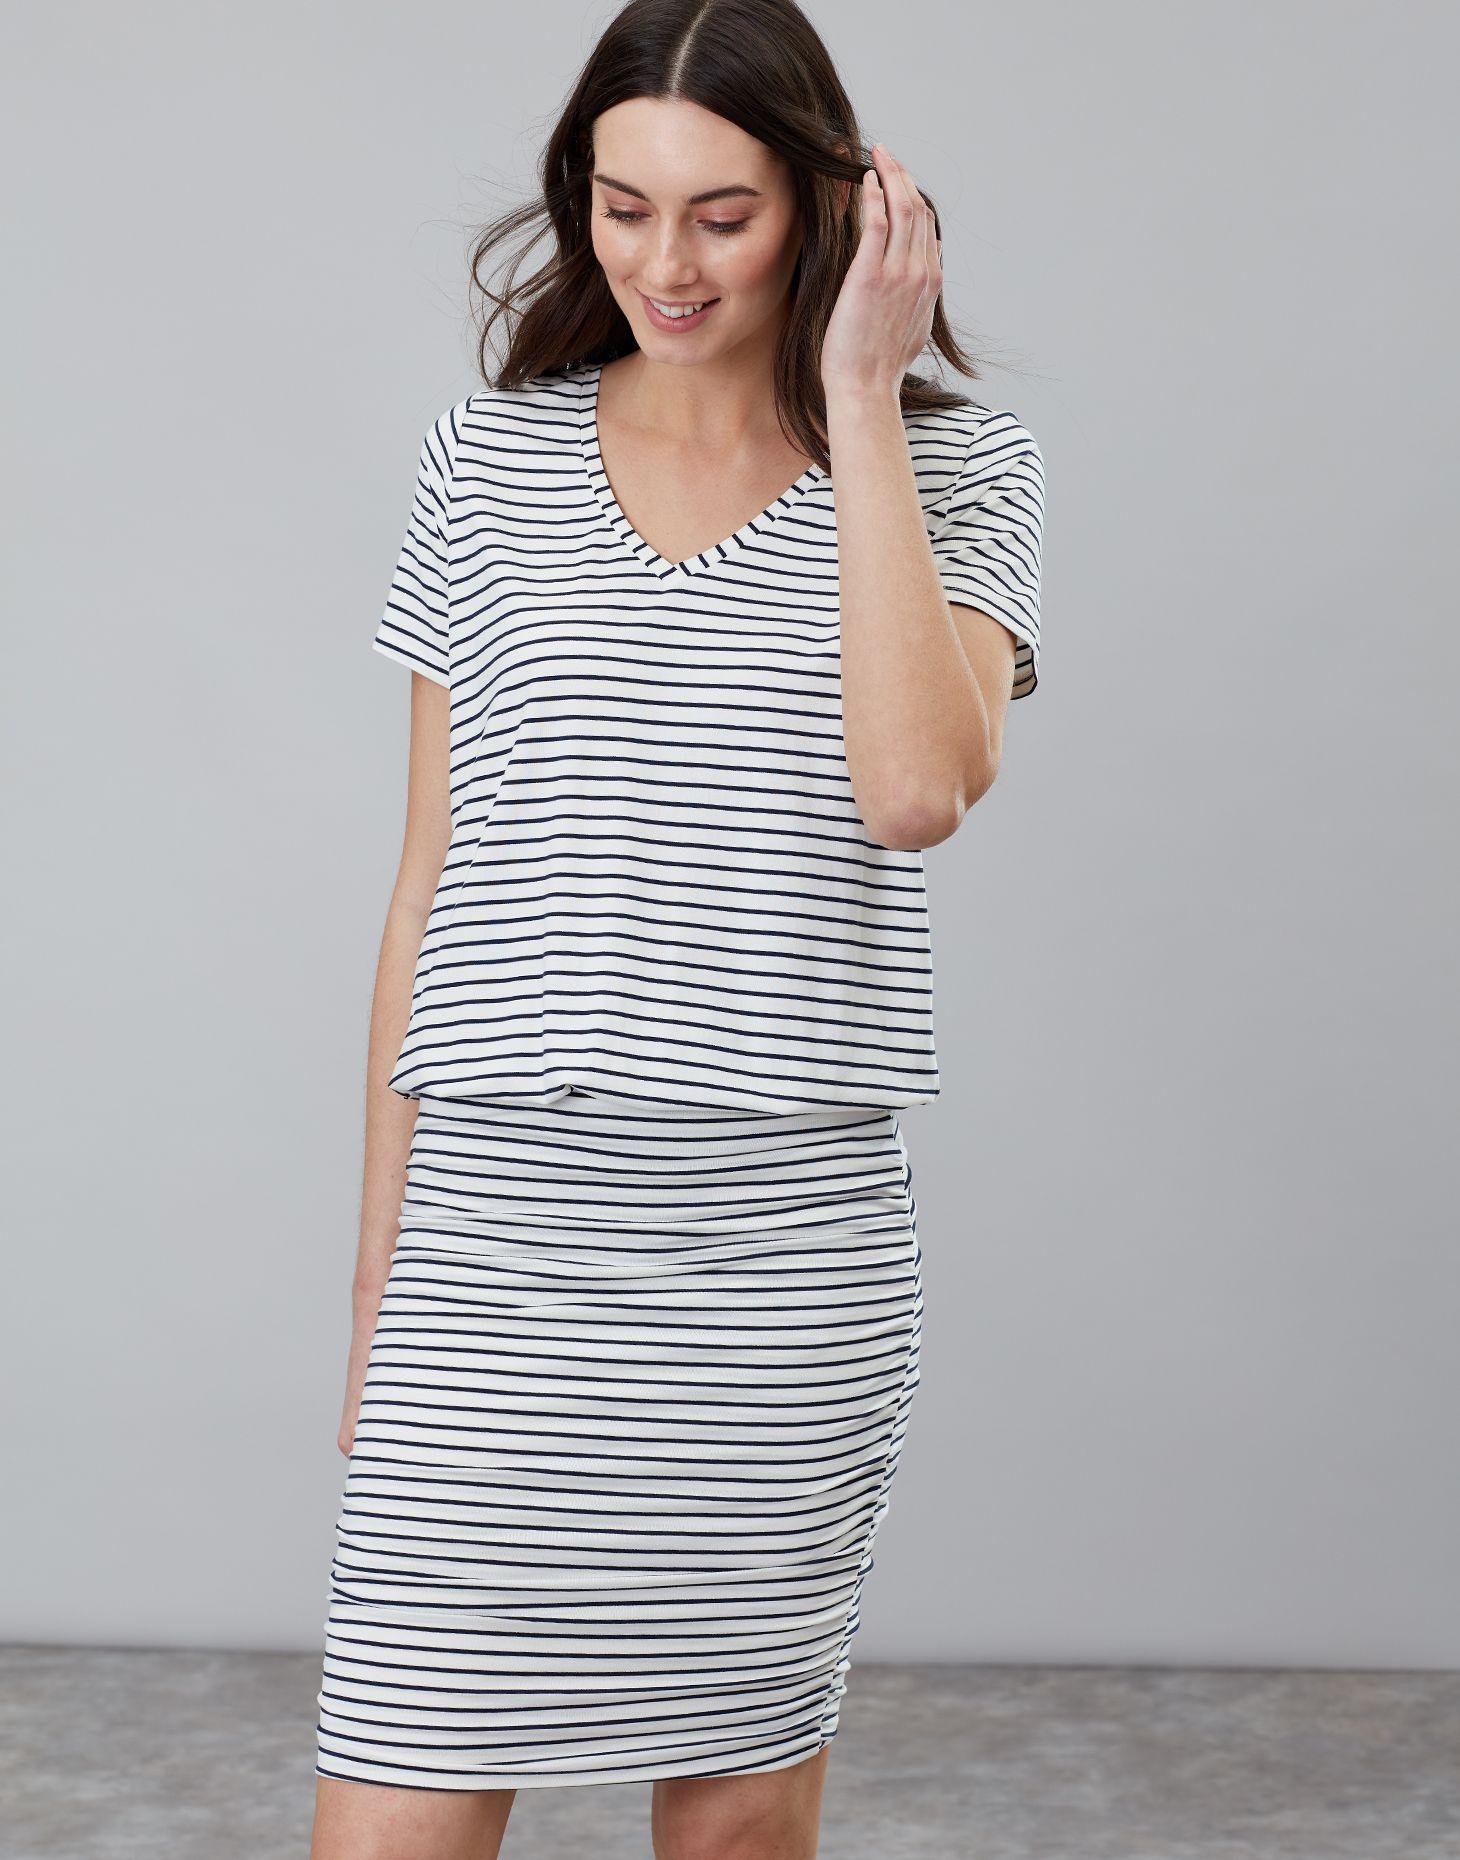 36514559c5 Candice NAVY CREAM STRIPE V Neck Jersey Dress With Gathered Skirt ...